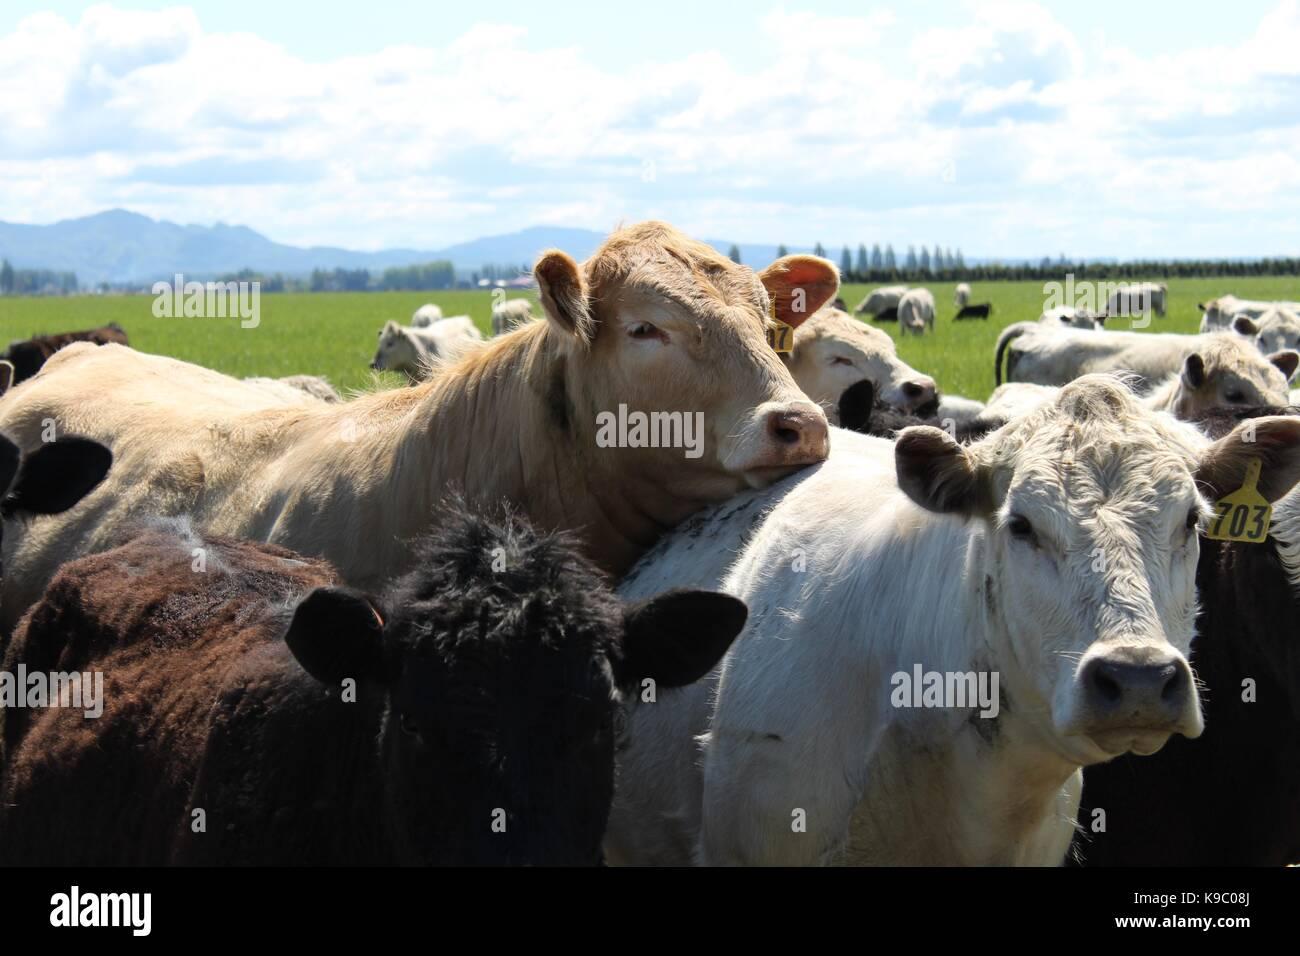 Sleepy Cows Stock Photo